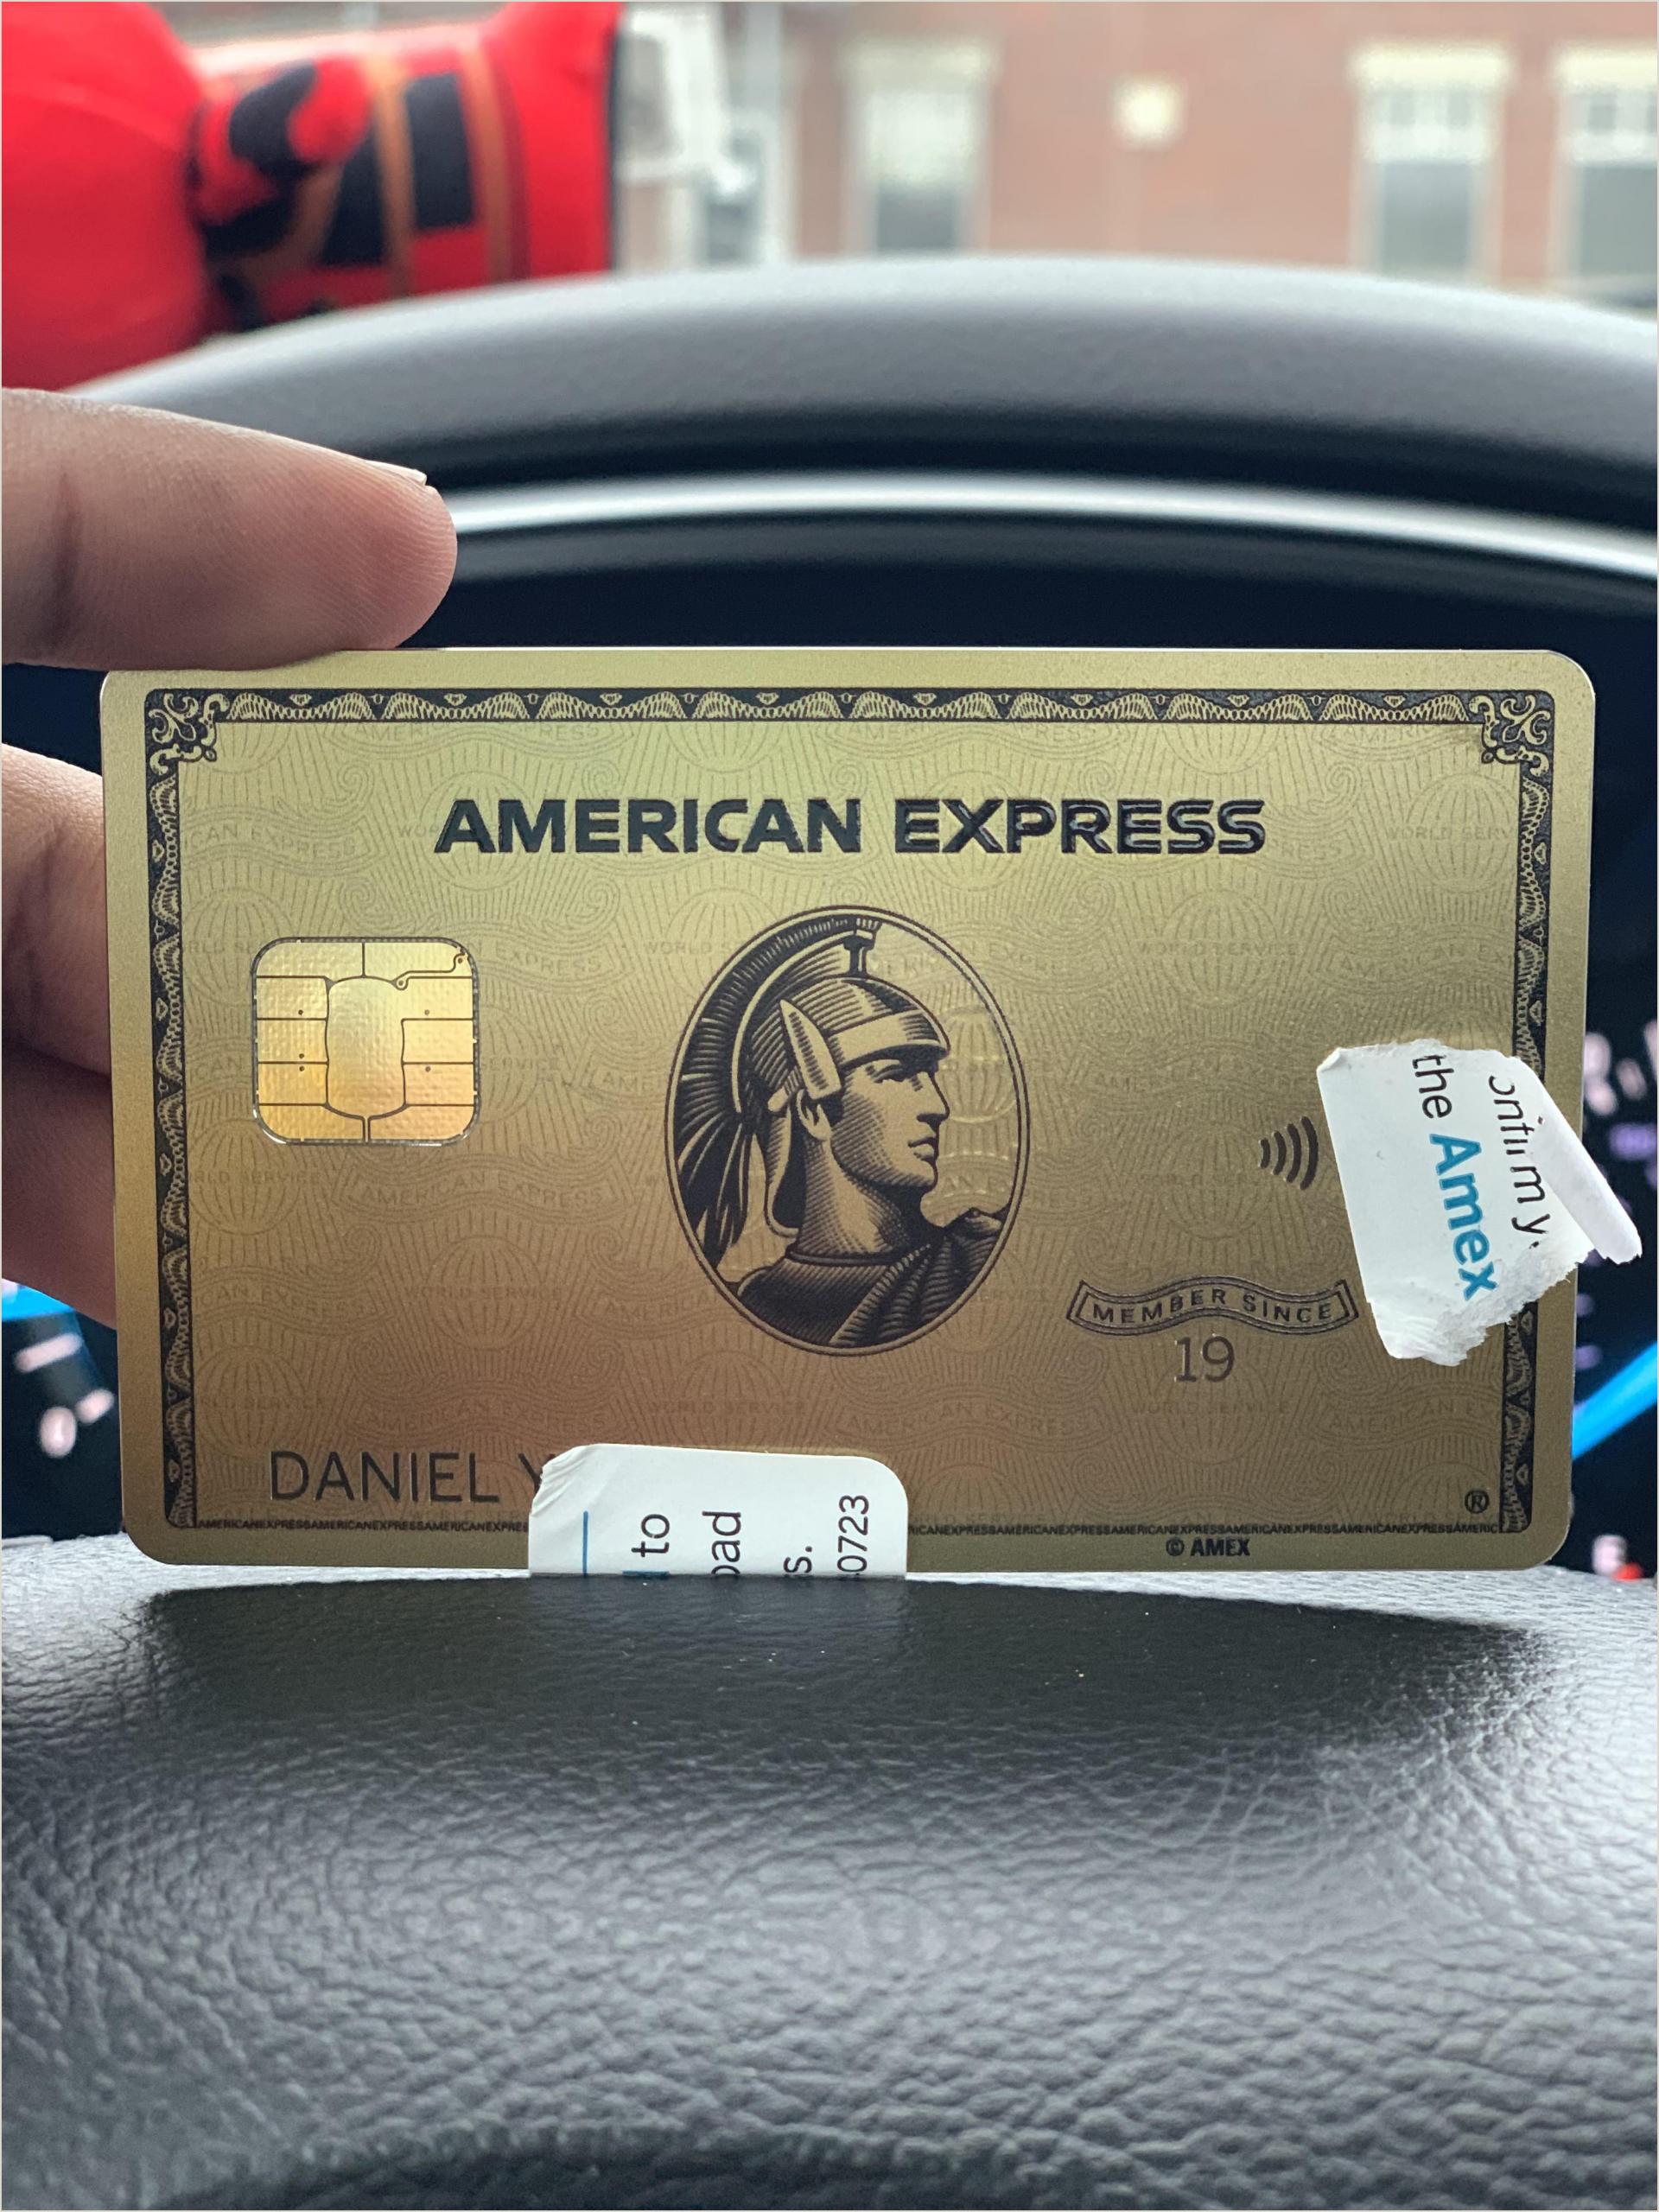 Reddit Best Business Cards Site Best Travel Credit Card No Annual Fee Reddit